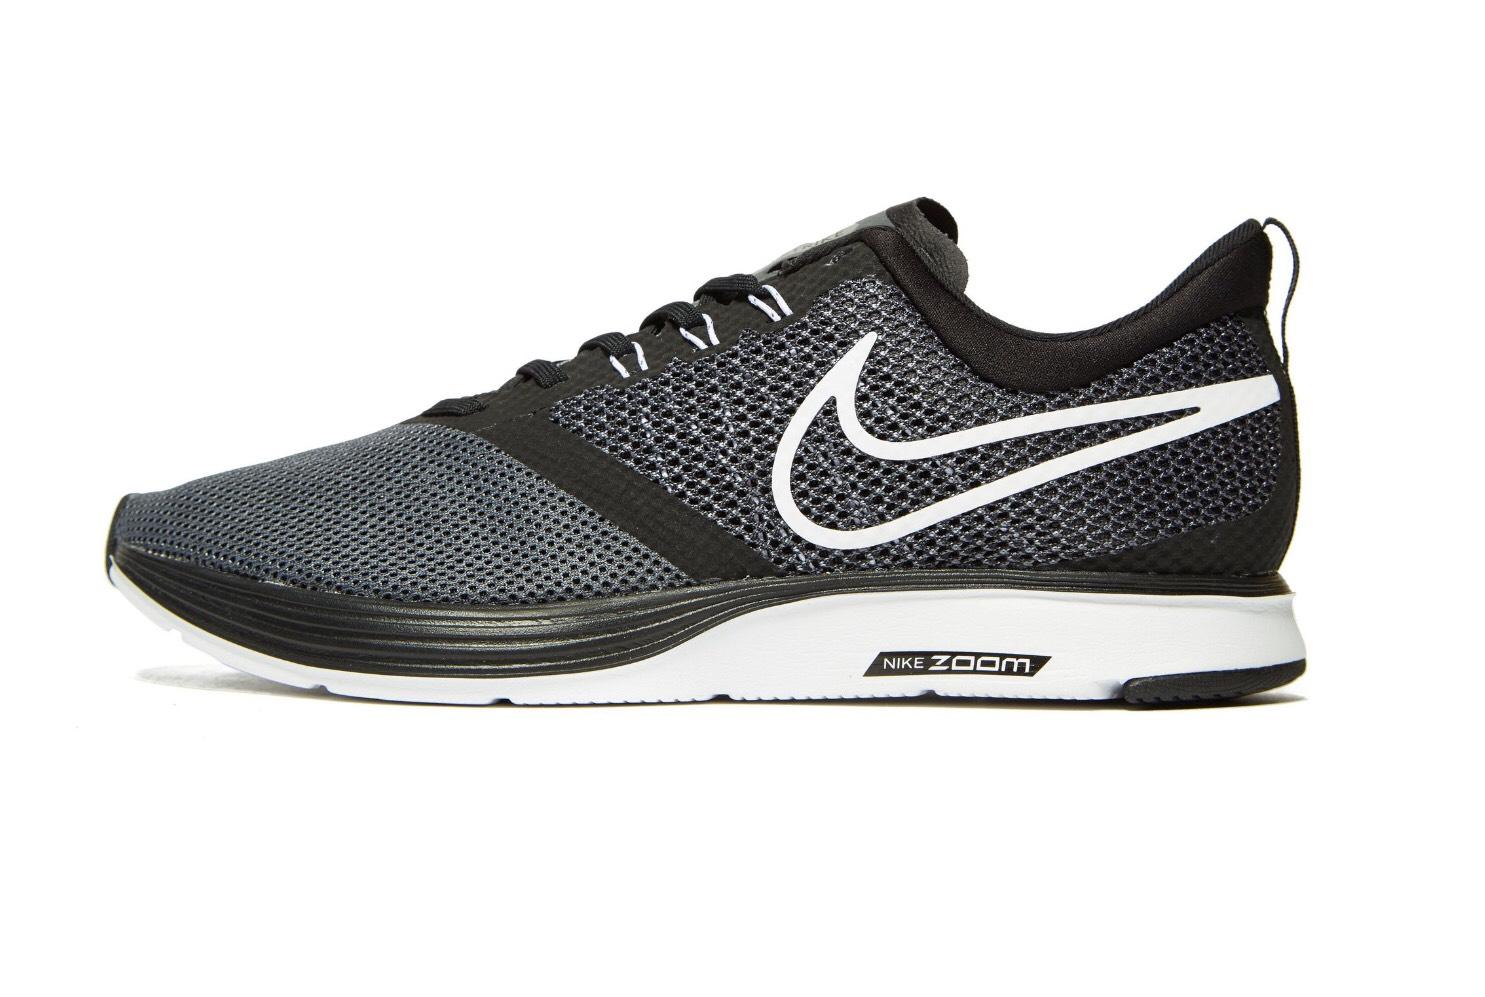 Chaussures Nike Zoom Strike - noir (du 40 au 47.5)